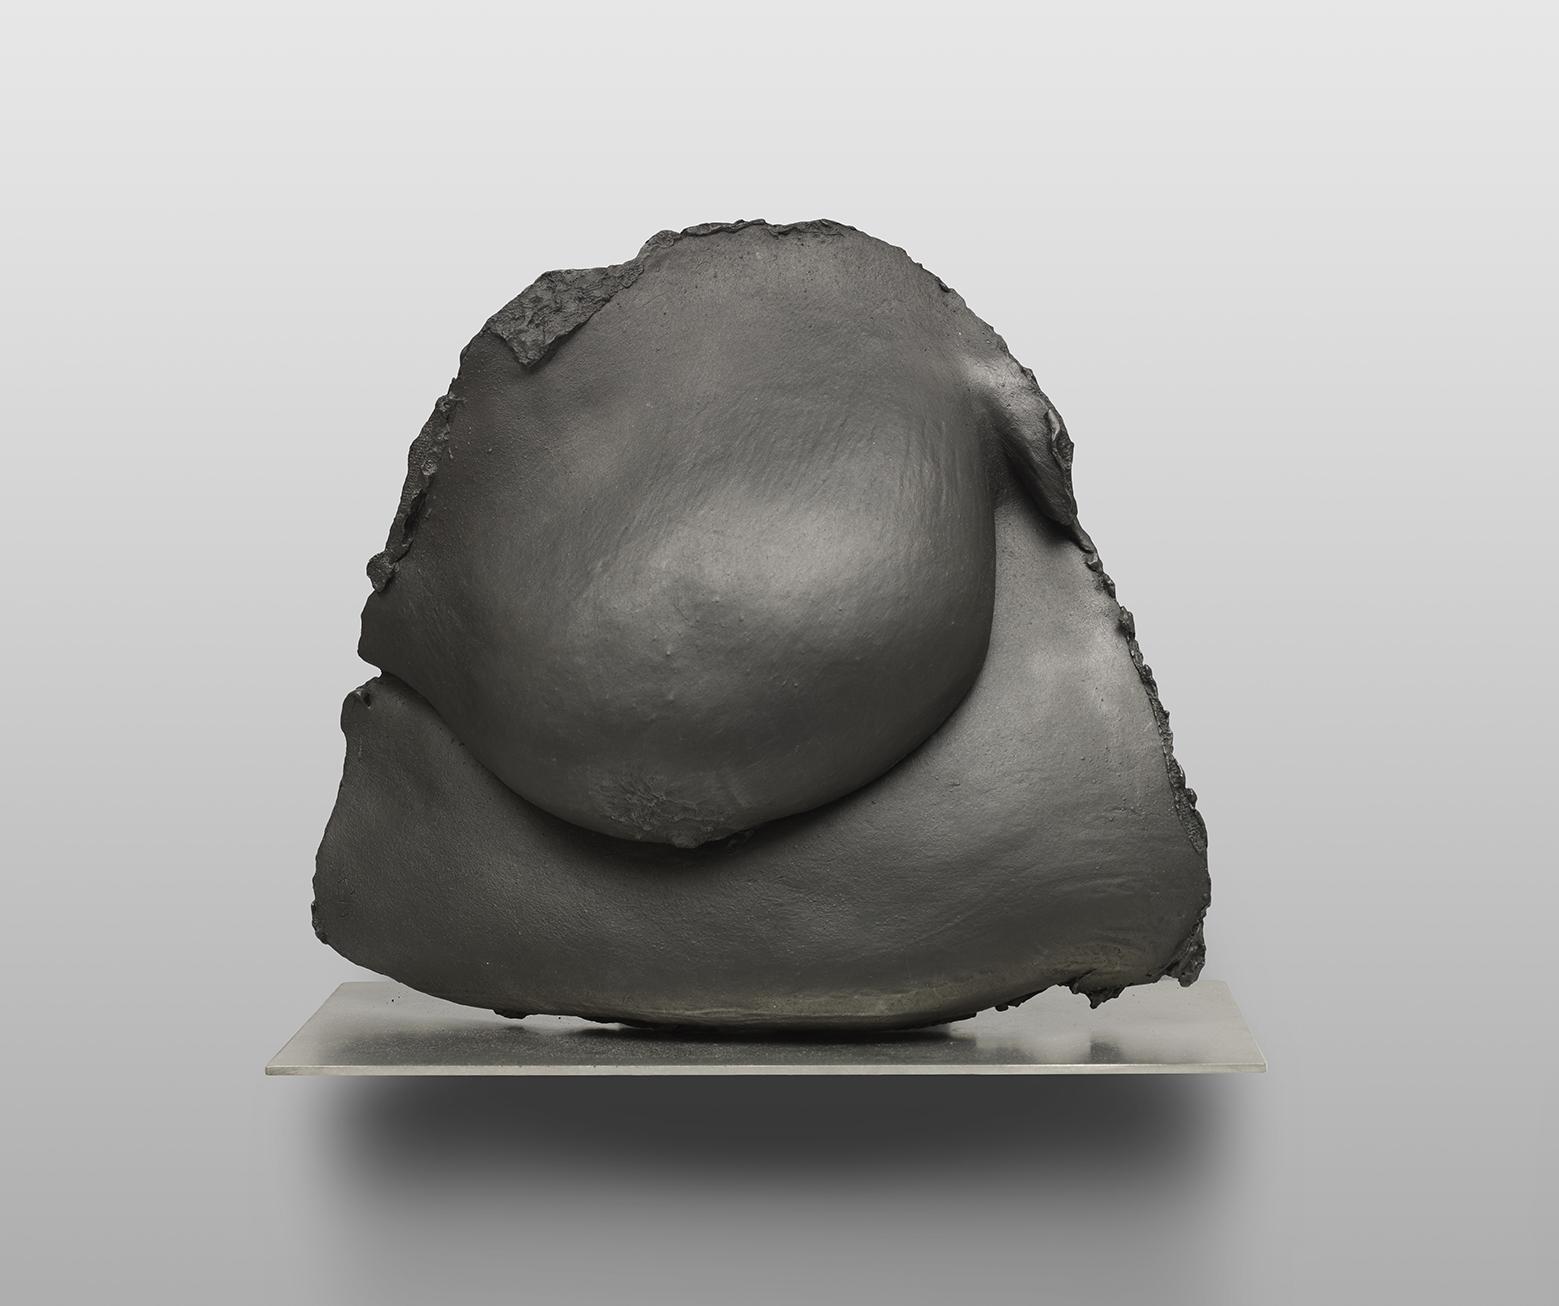 """Gaia"", 2018, Bronze Edition of 3, W: 38 x H: 40 cms"